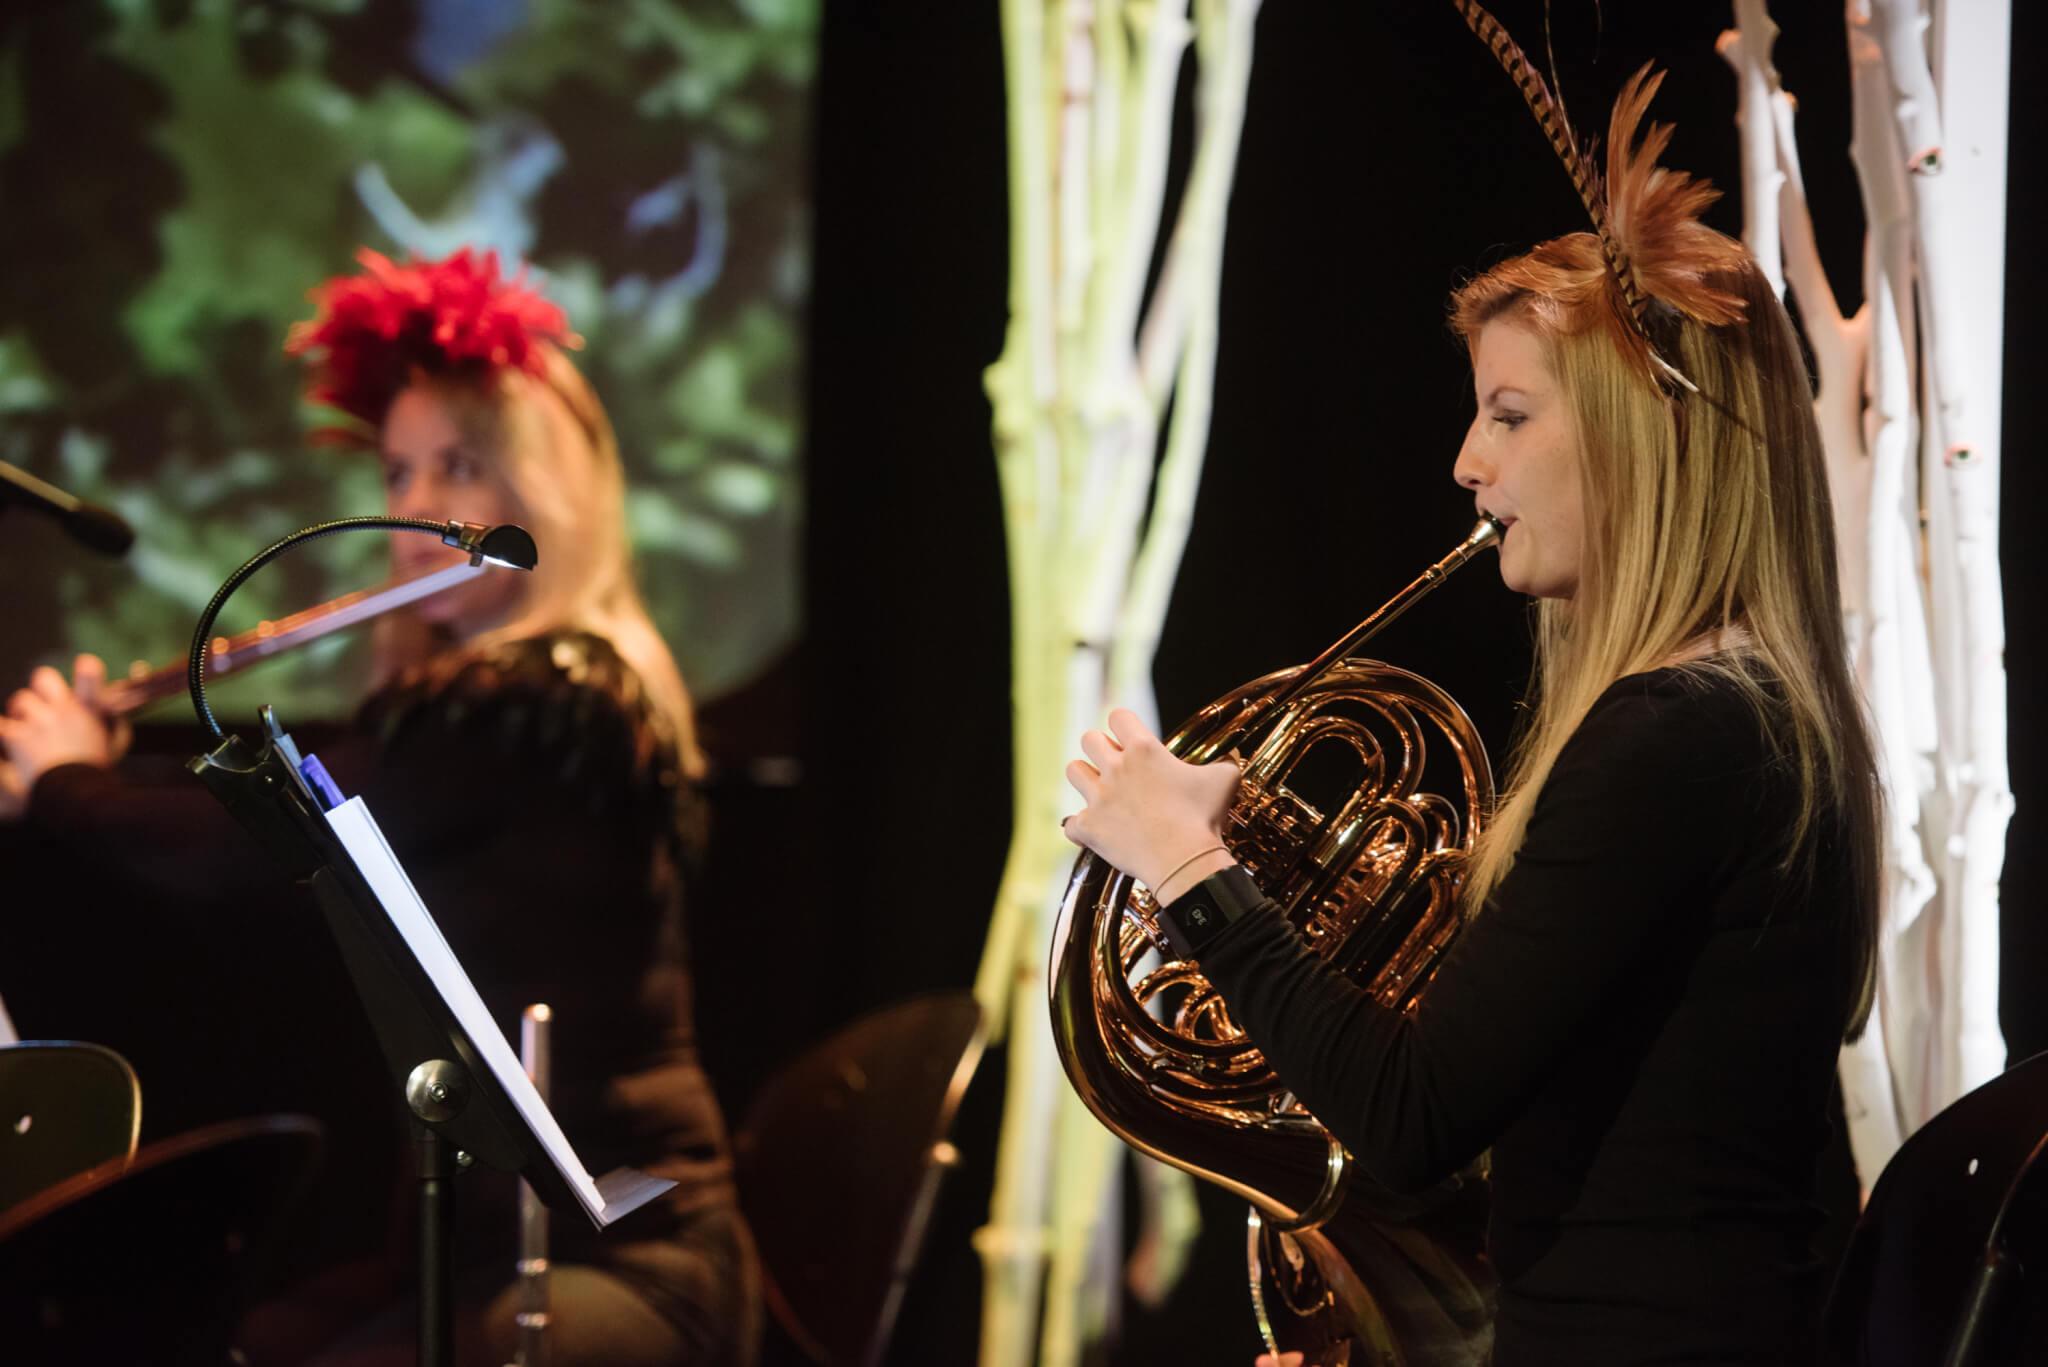 Sarah Bennett – Flute Carys Evans – Horn Sinfonia Cymru